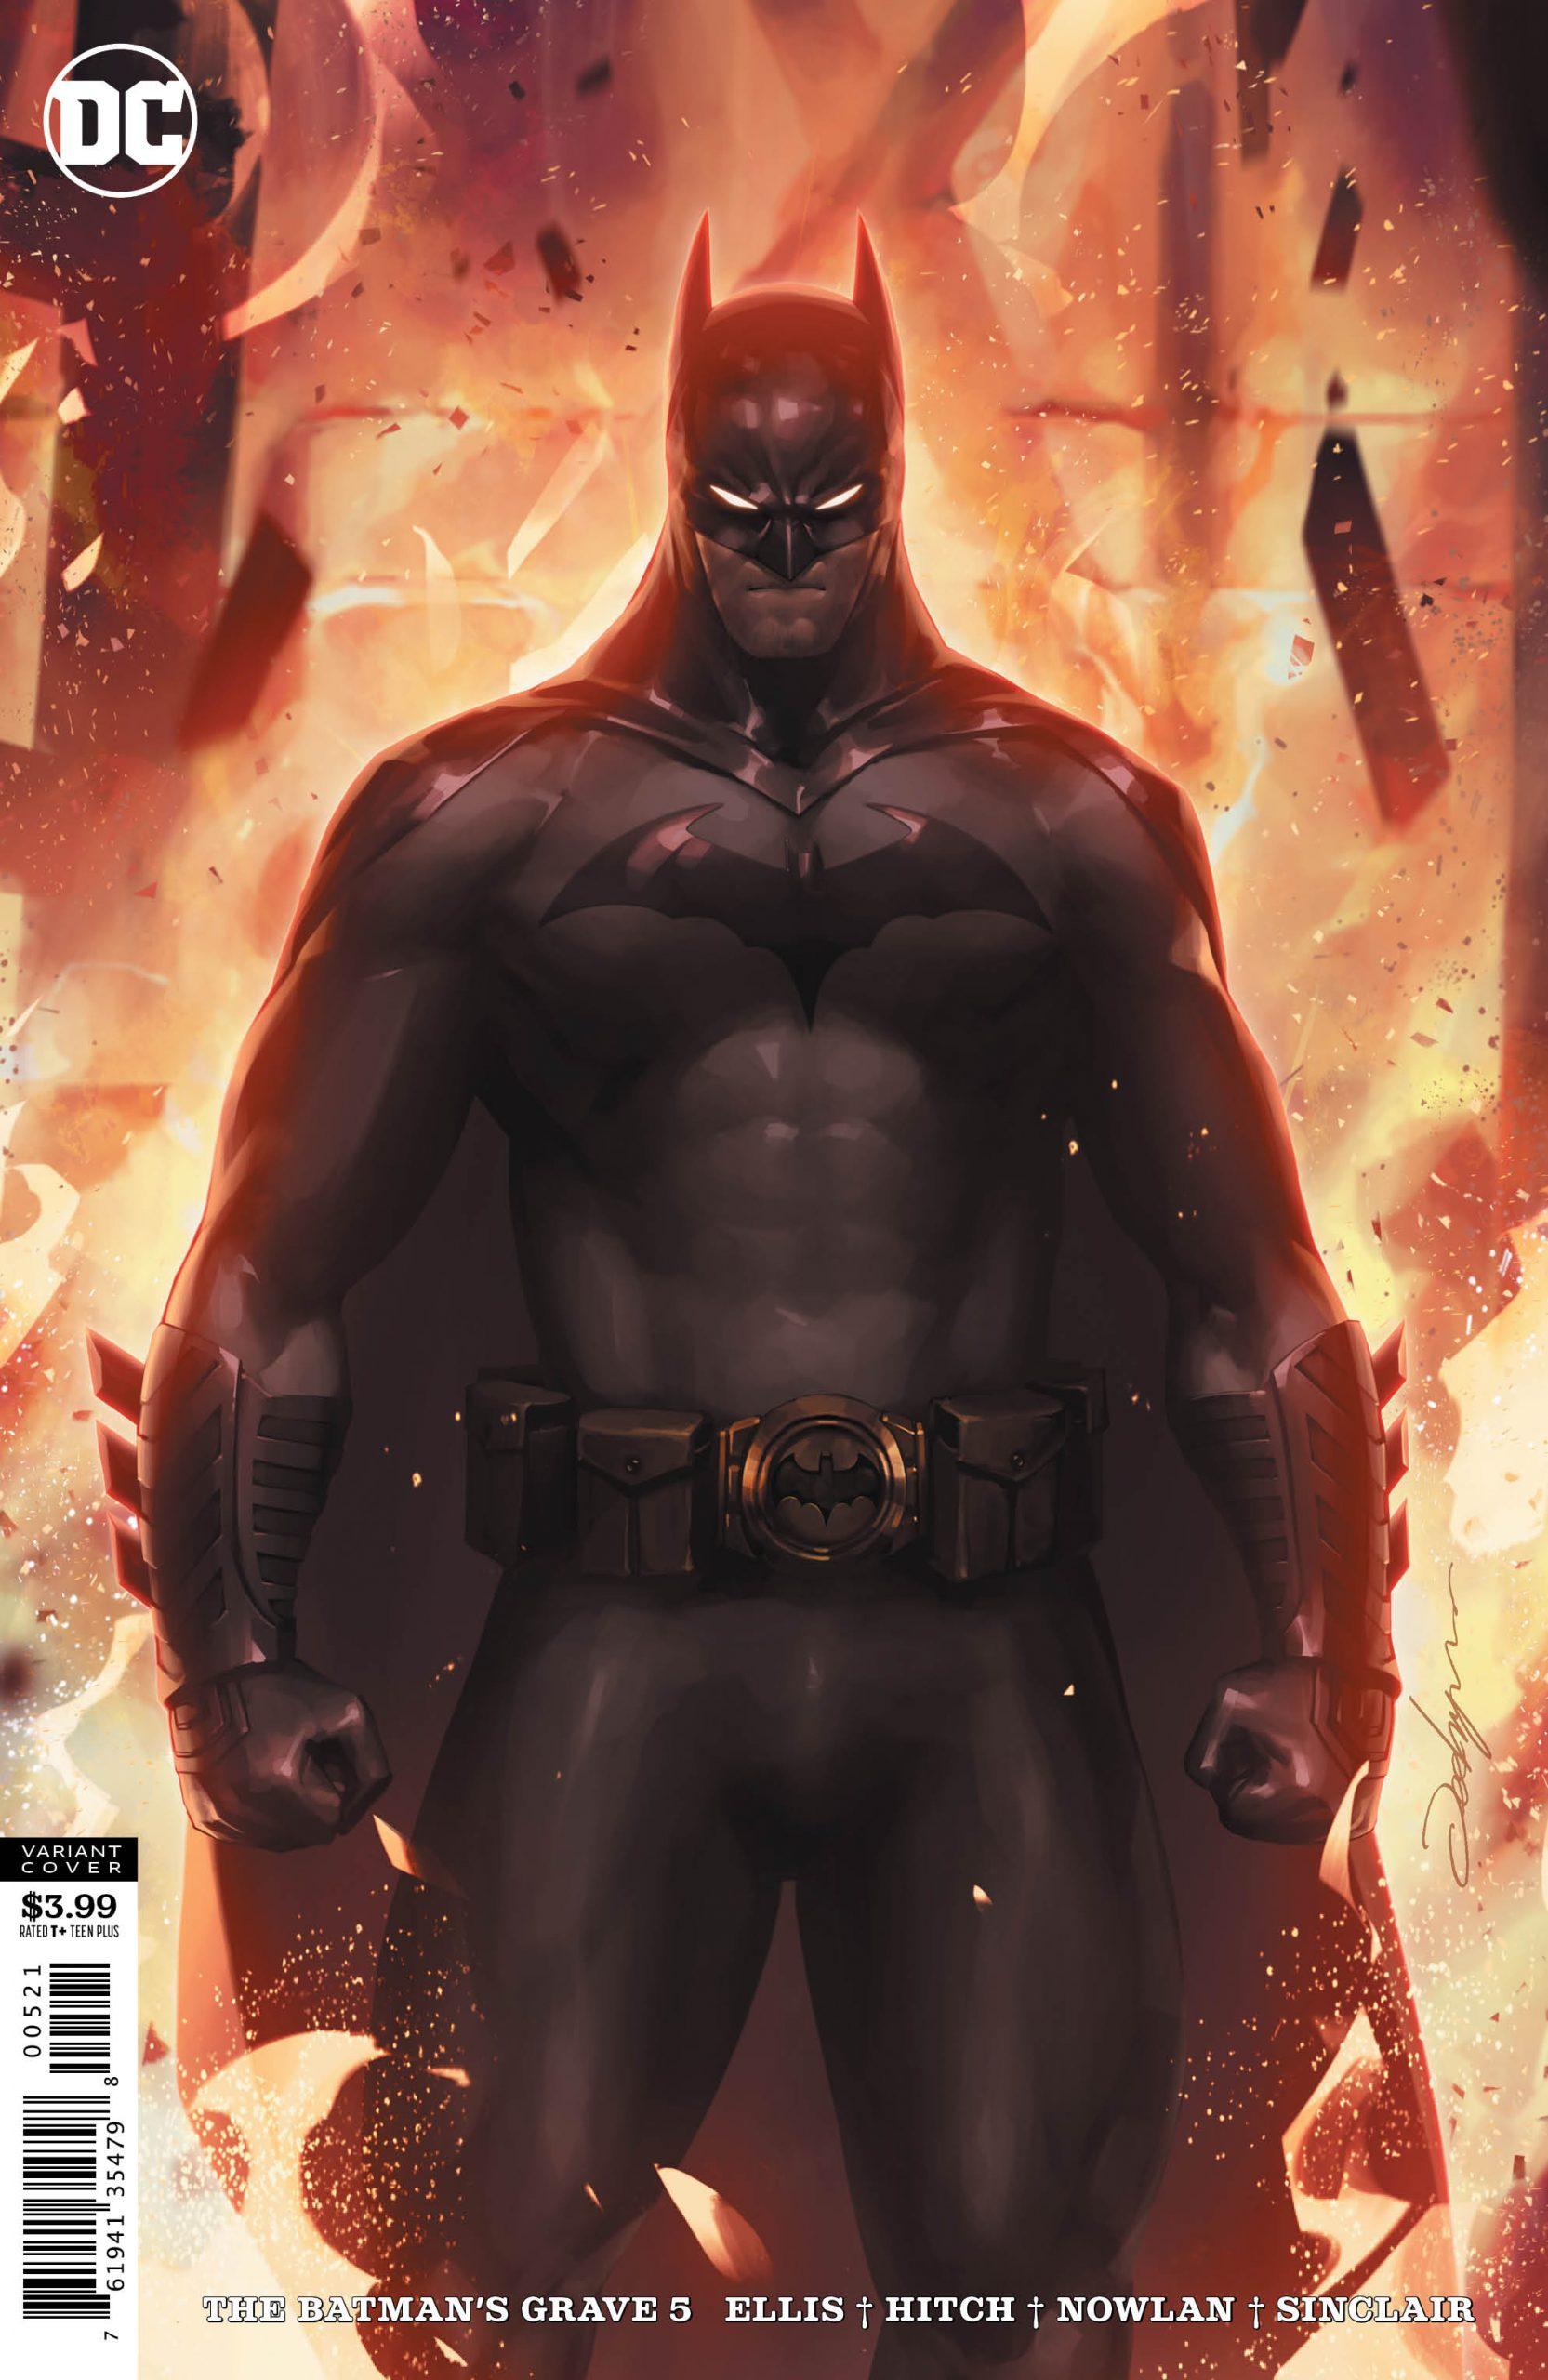 The Batman's Grave #5 Alternate Cover